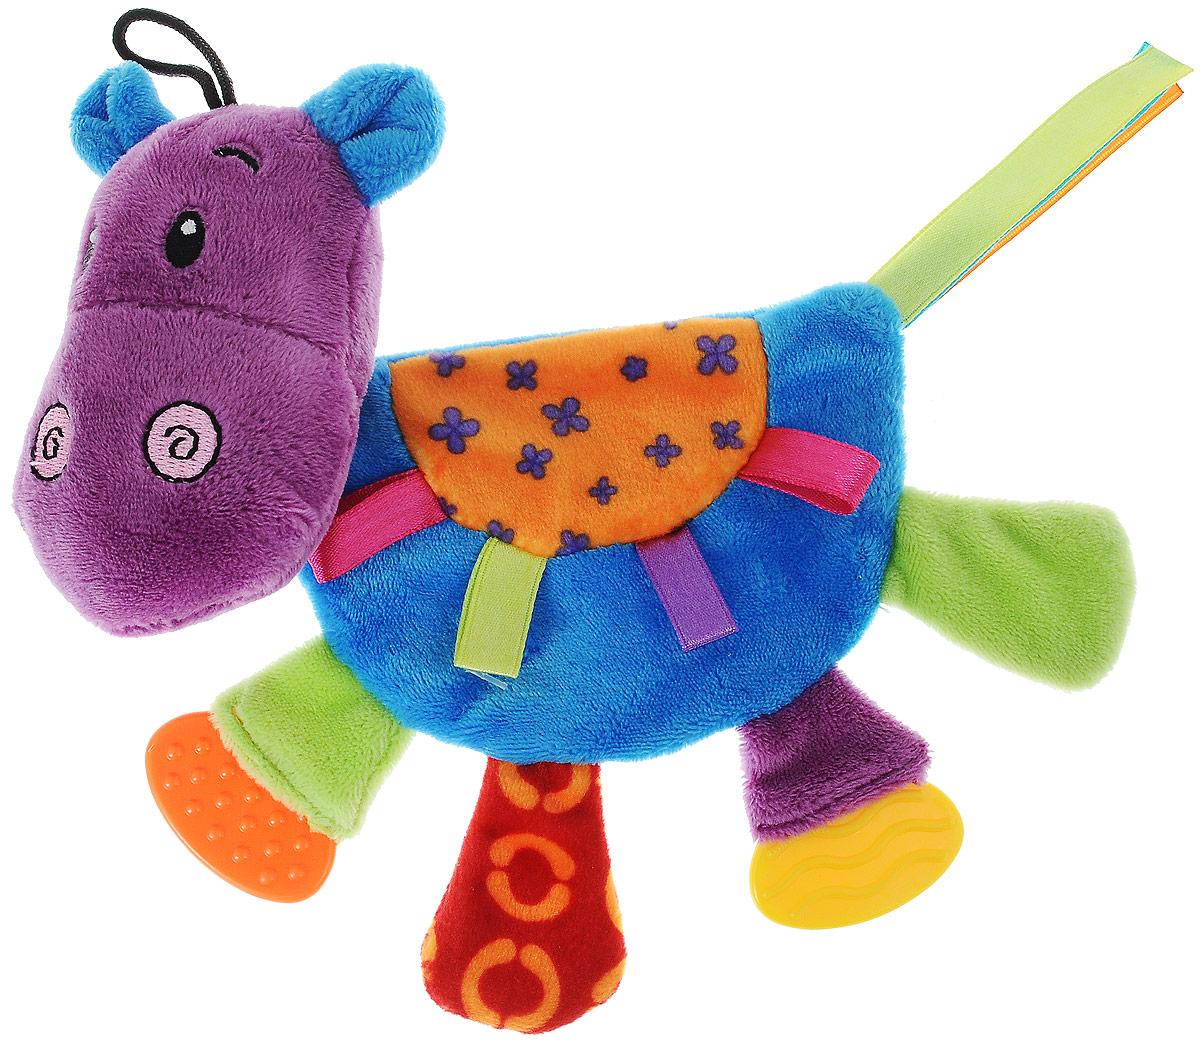 Игрушка для щенков и собак мелких пород Zolux Бегемот Марси, шуршащая zolux zolux игрушка латексная корова оранжевая 18 см